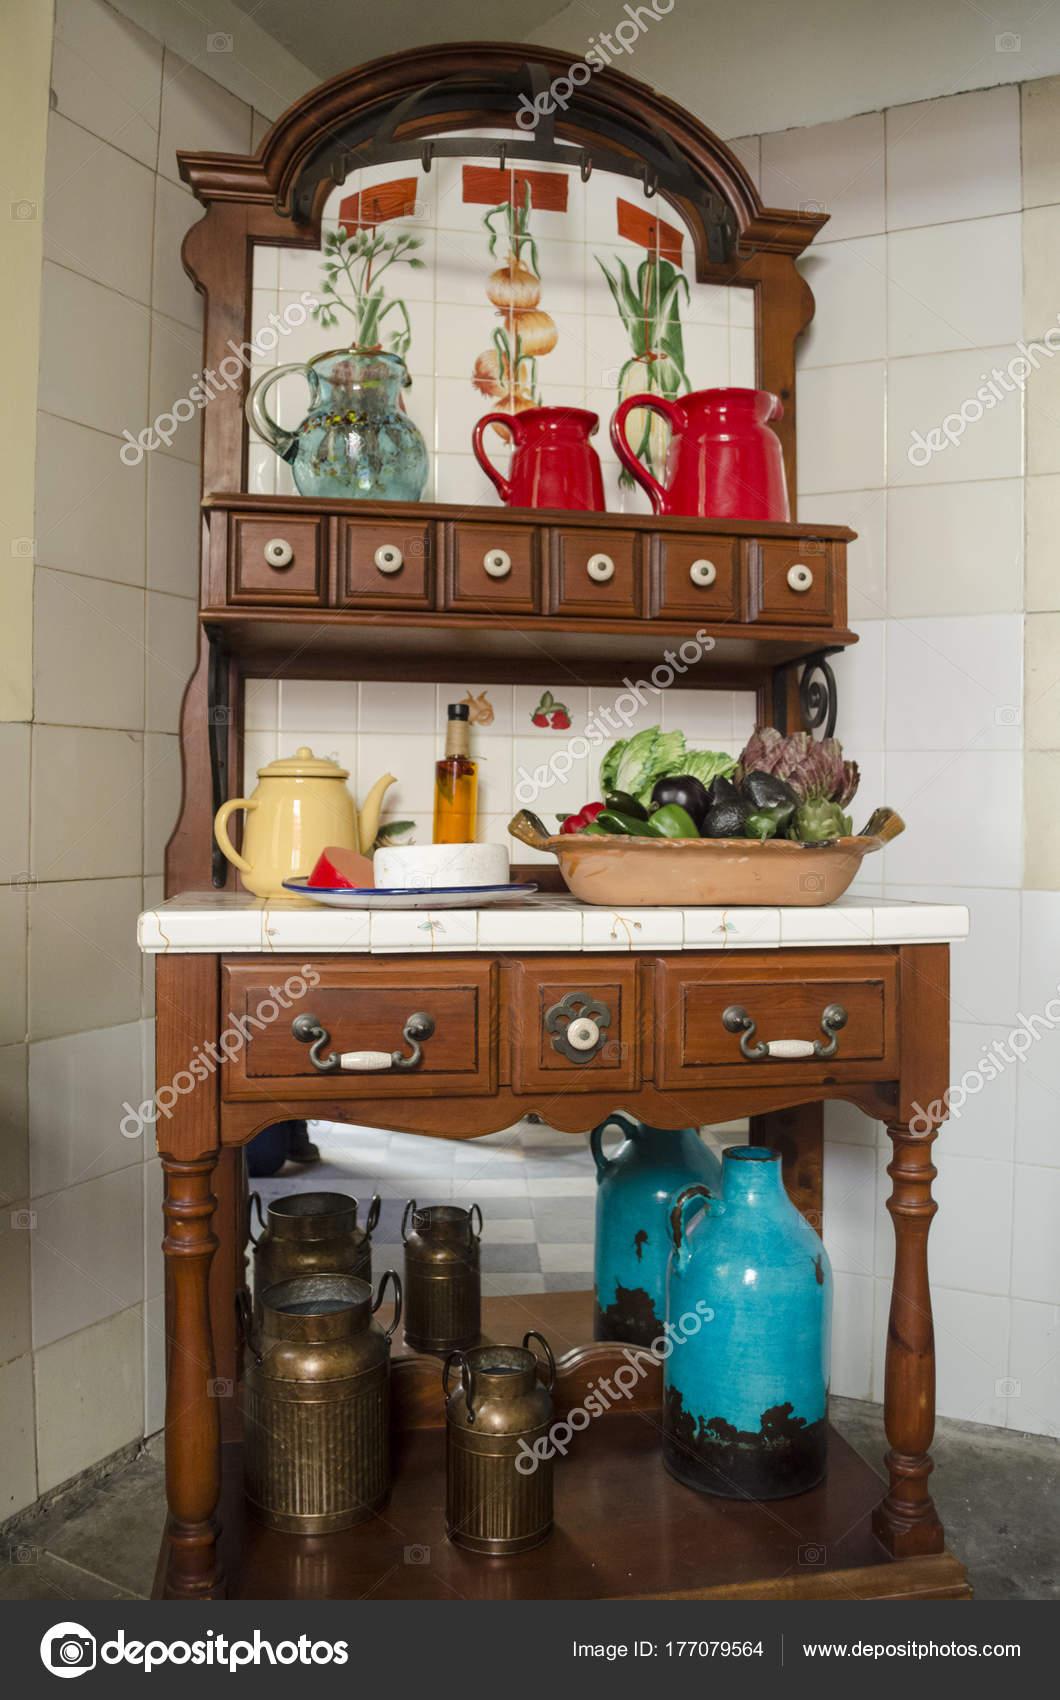 white kitchen buffet aid walmart forniture 的罐子和塑料水果墨西哥厨房的一部分 图库照片 c auroraangeles 一块forniture 的罐子和塑料水果 墨西哥厨房的一部分 照片作者auroraangeles